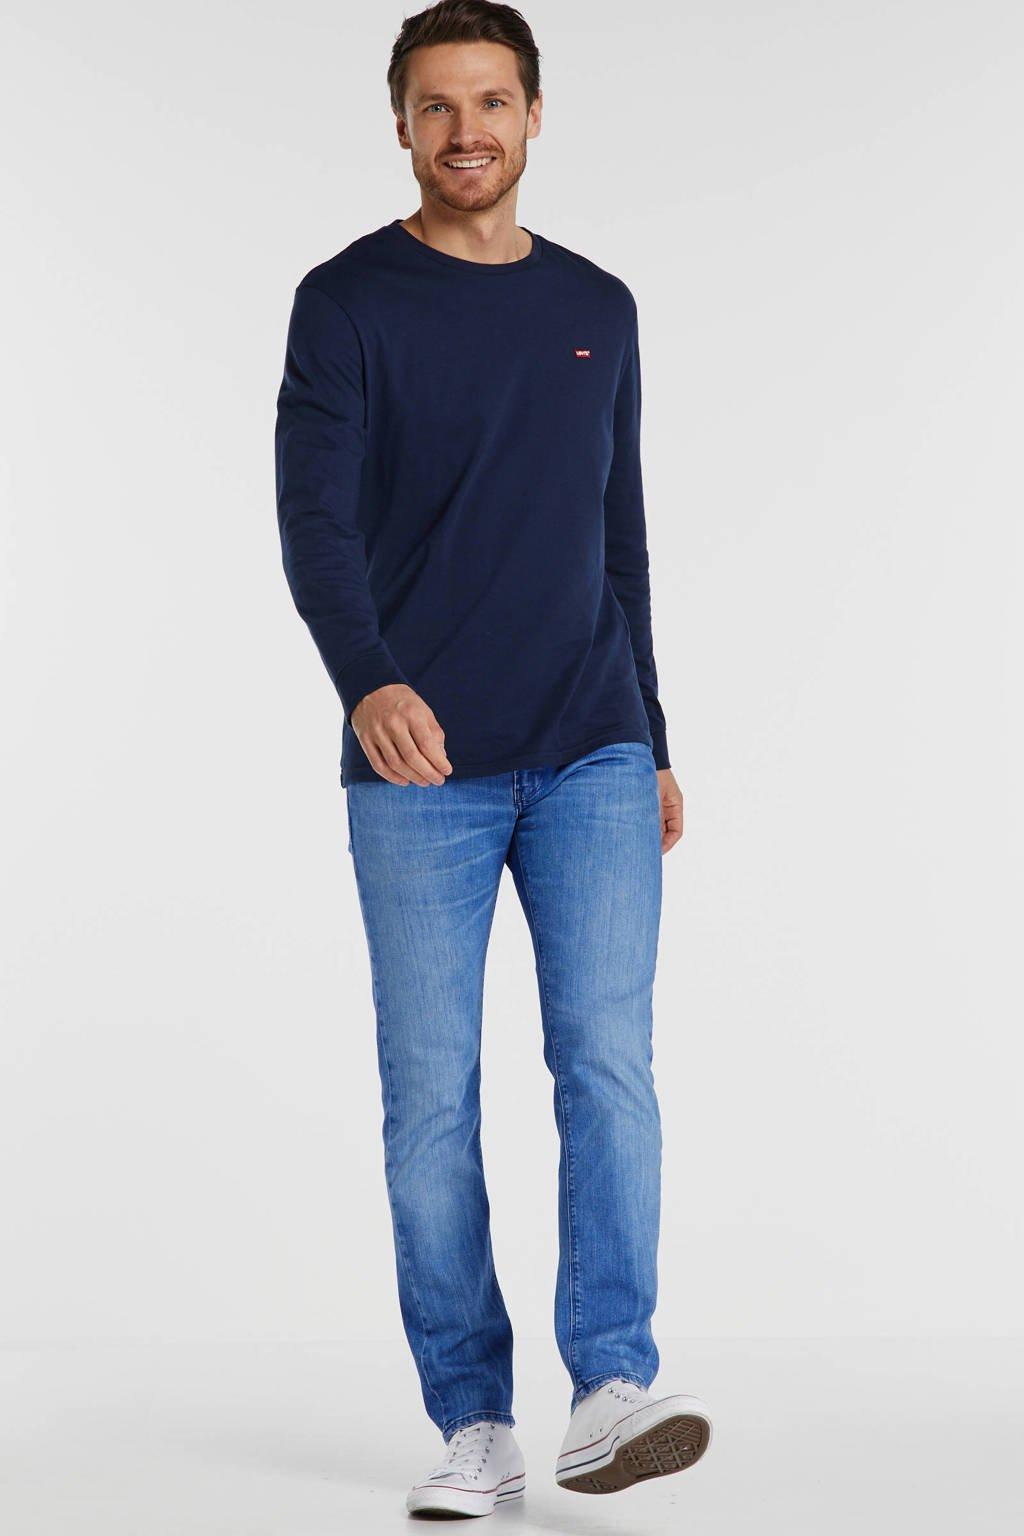 Pepe Jeans regular fit jeans Zinc denim, 000DENIM